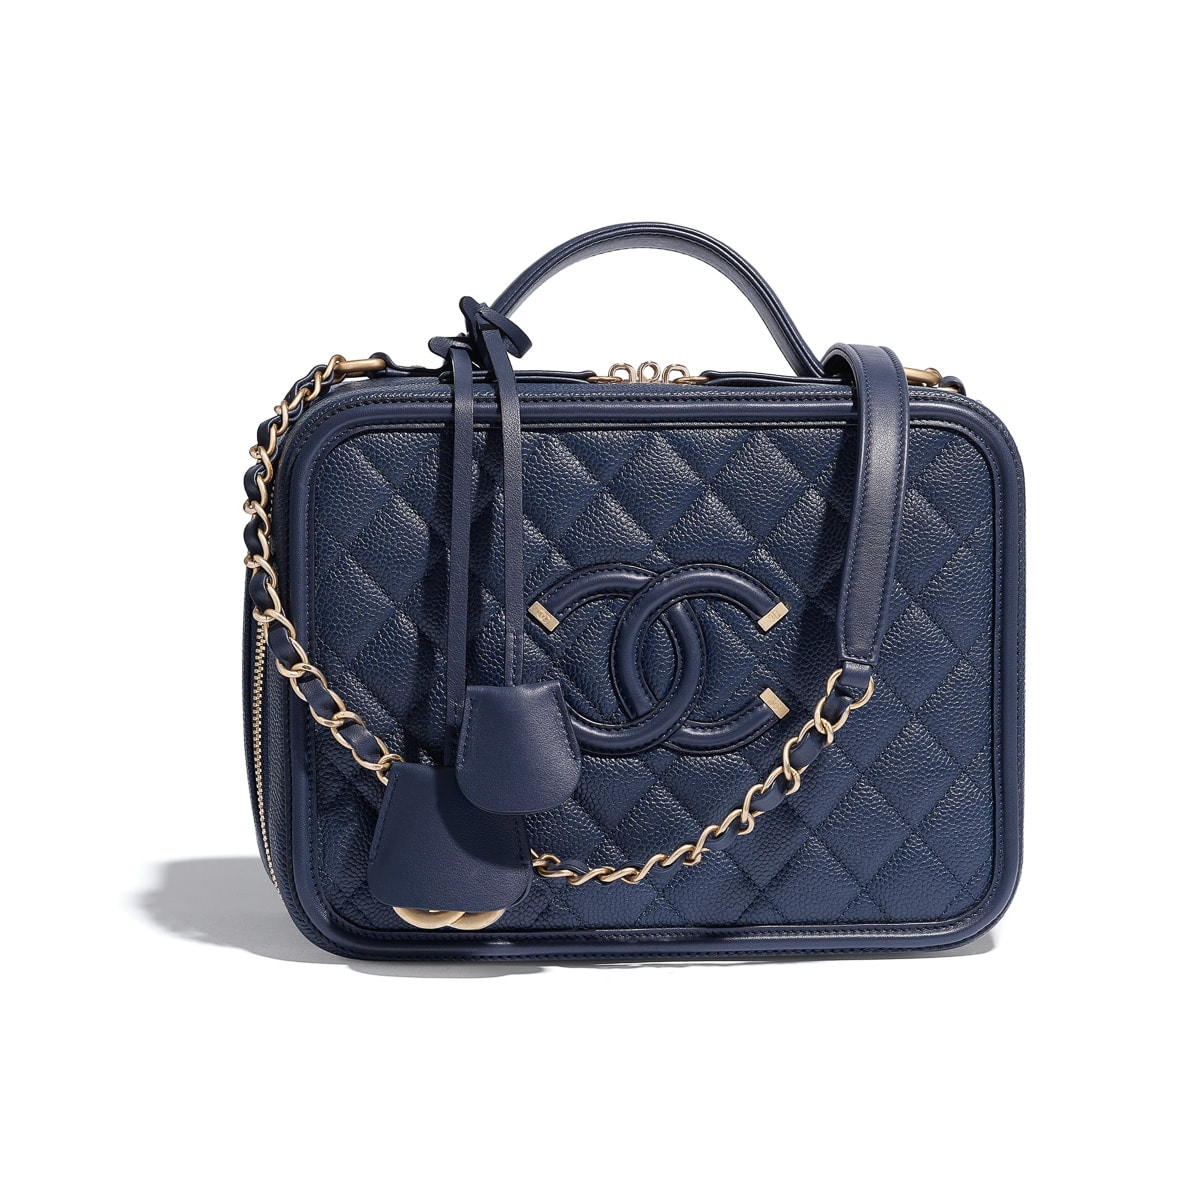 Chanel Gabrielle Bag 2019 Price | Jaguar Clubs of North ...